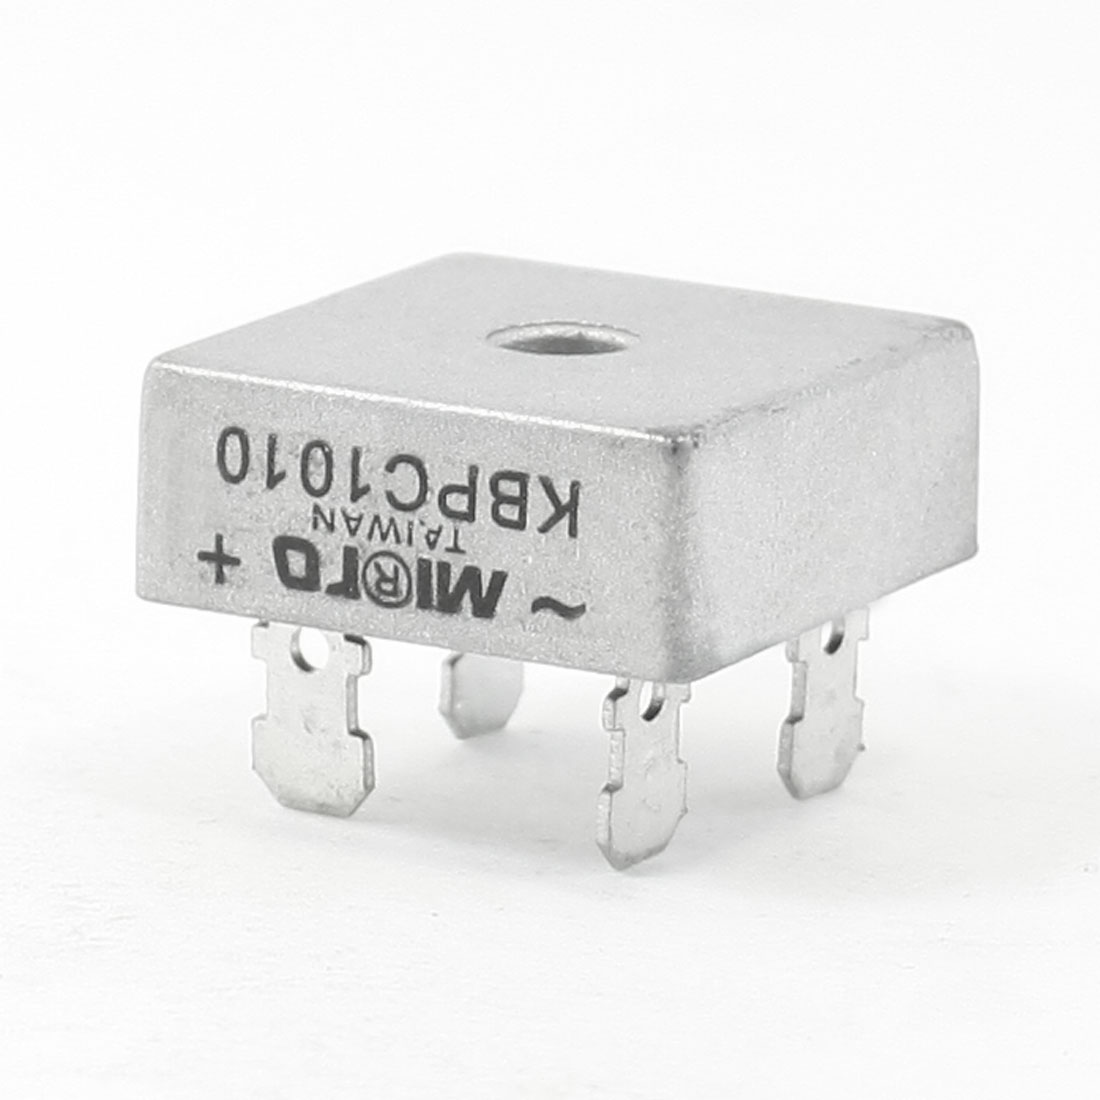 KBPC10-10 1KV 10A Single Phase Bridge Rectifier Half-Wave Silver Tone